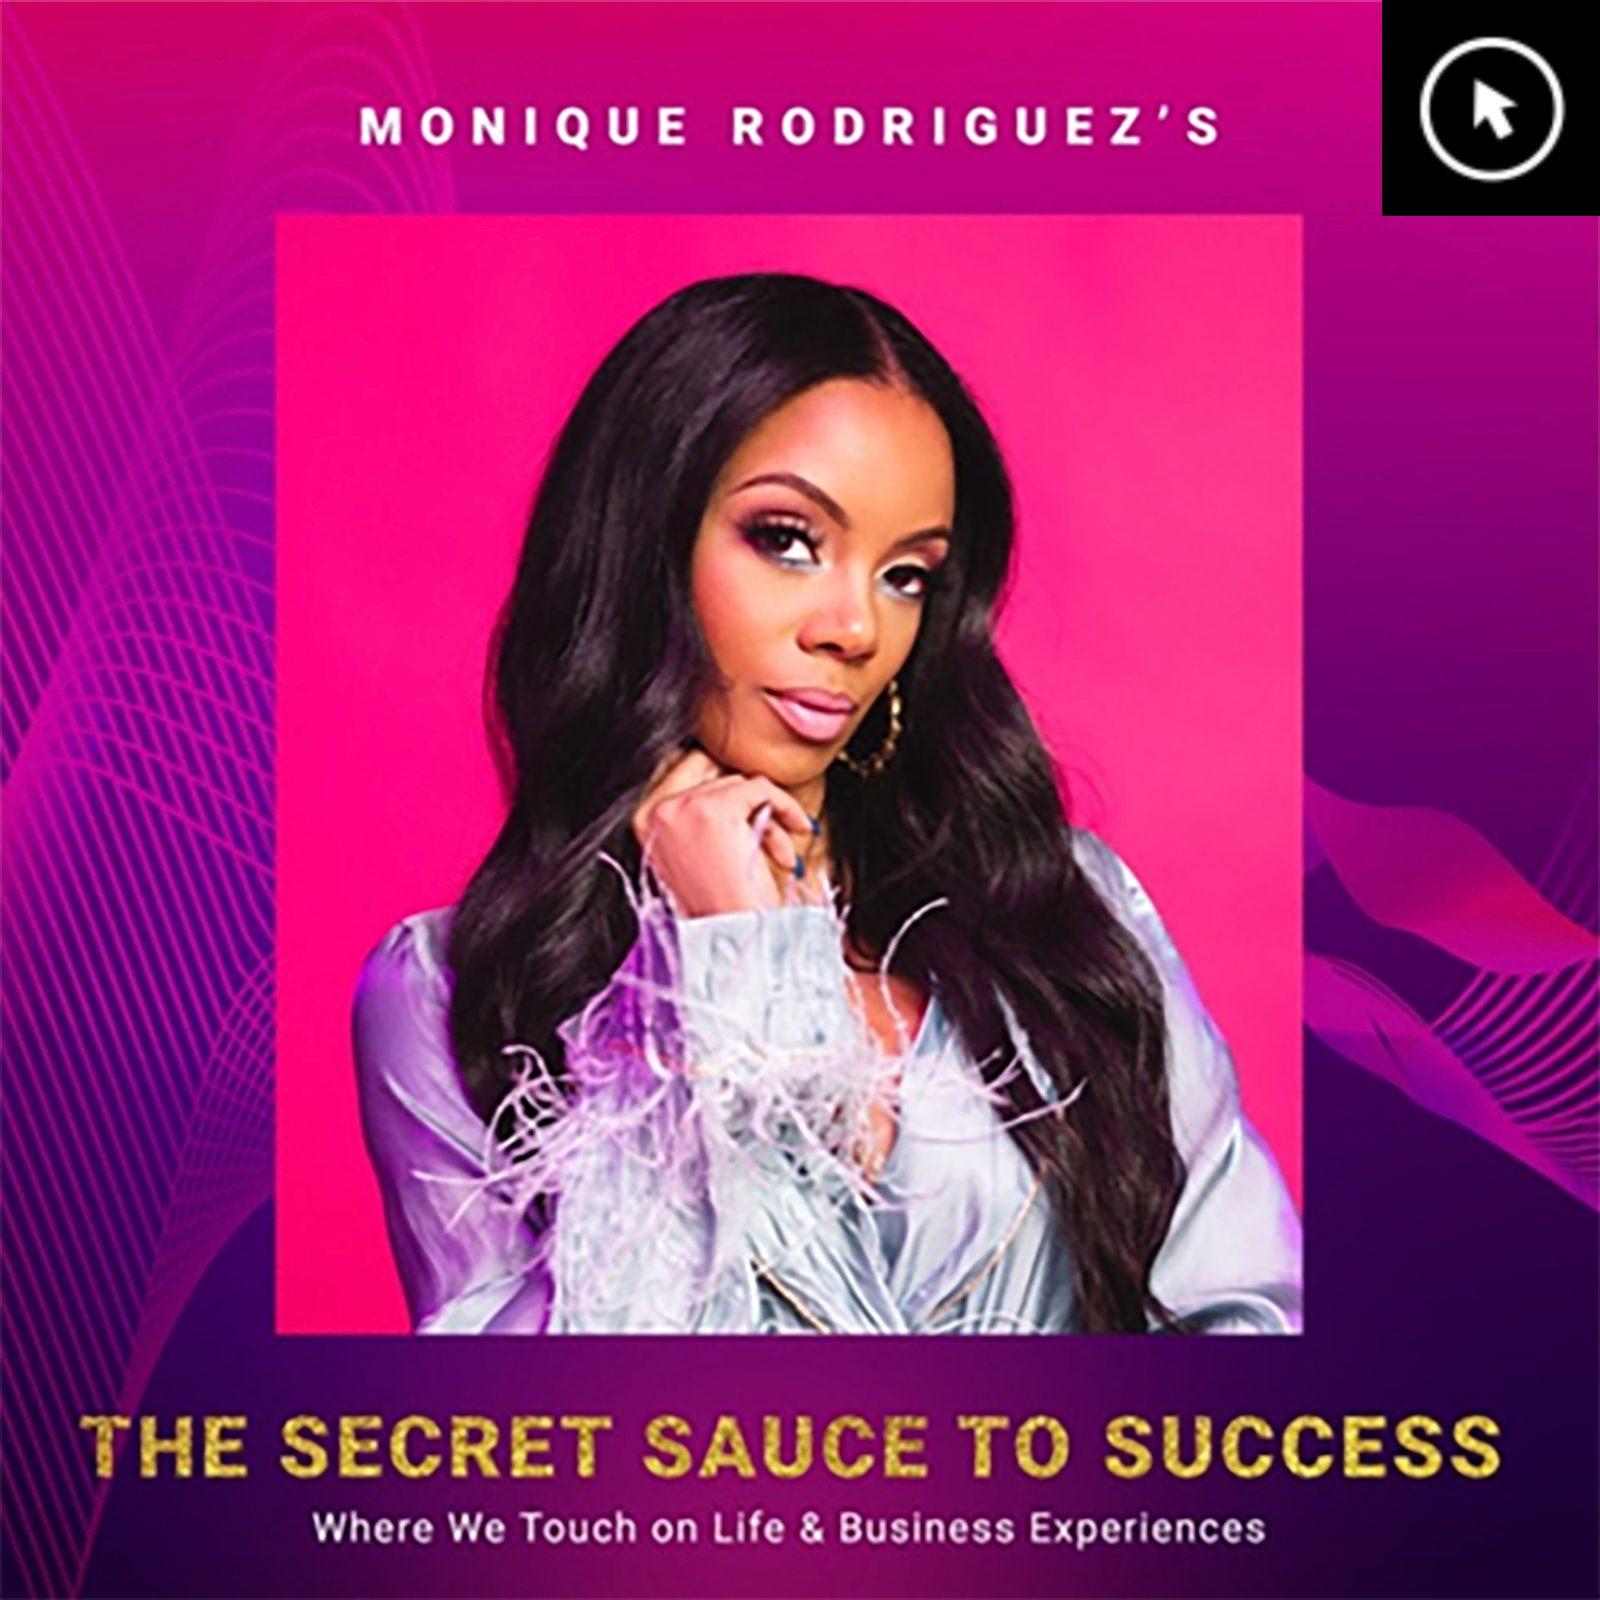 Podcast Review: The Secret Sauce to Success with Monique Rodriguez